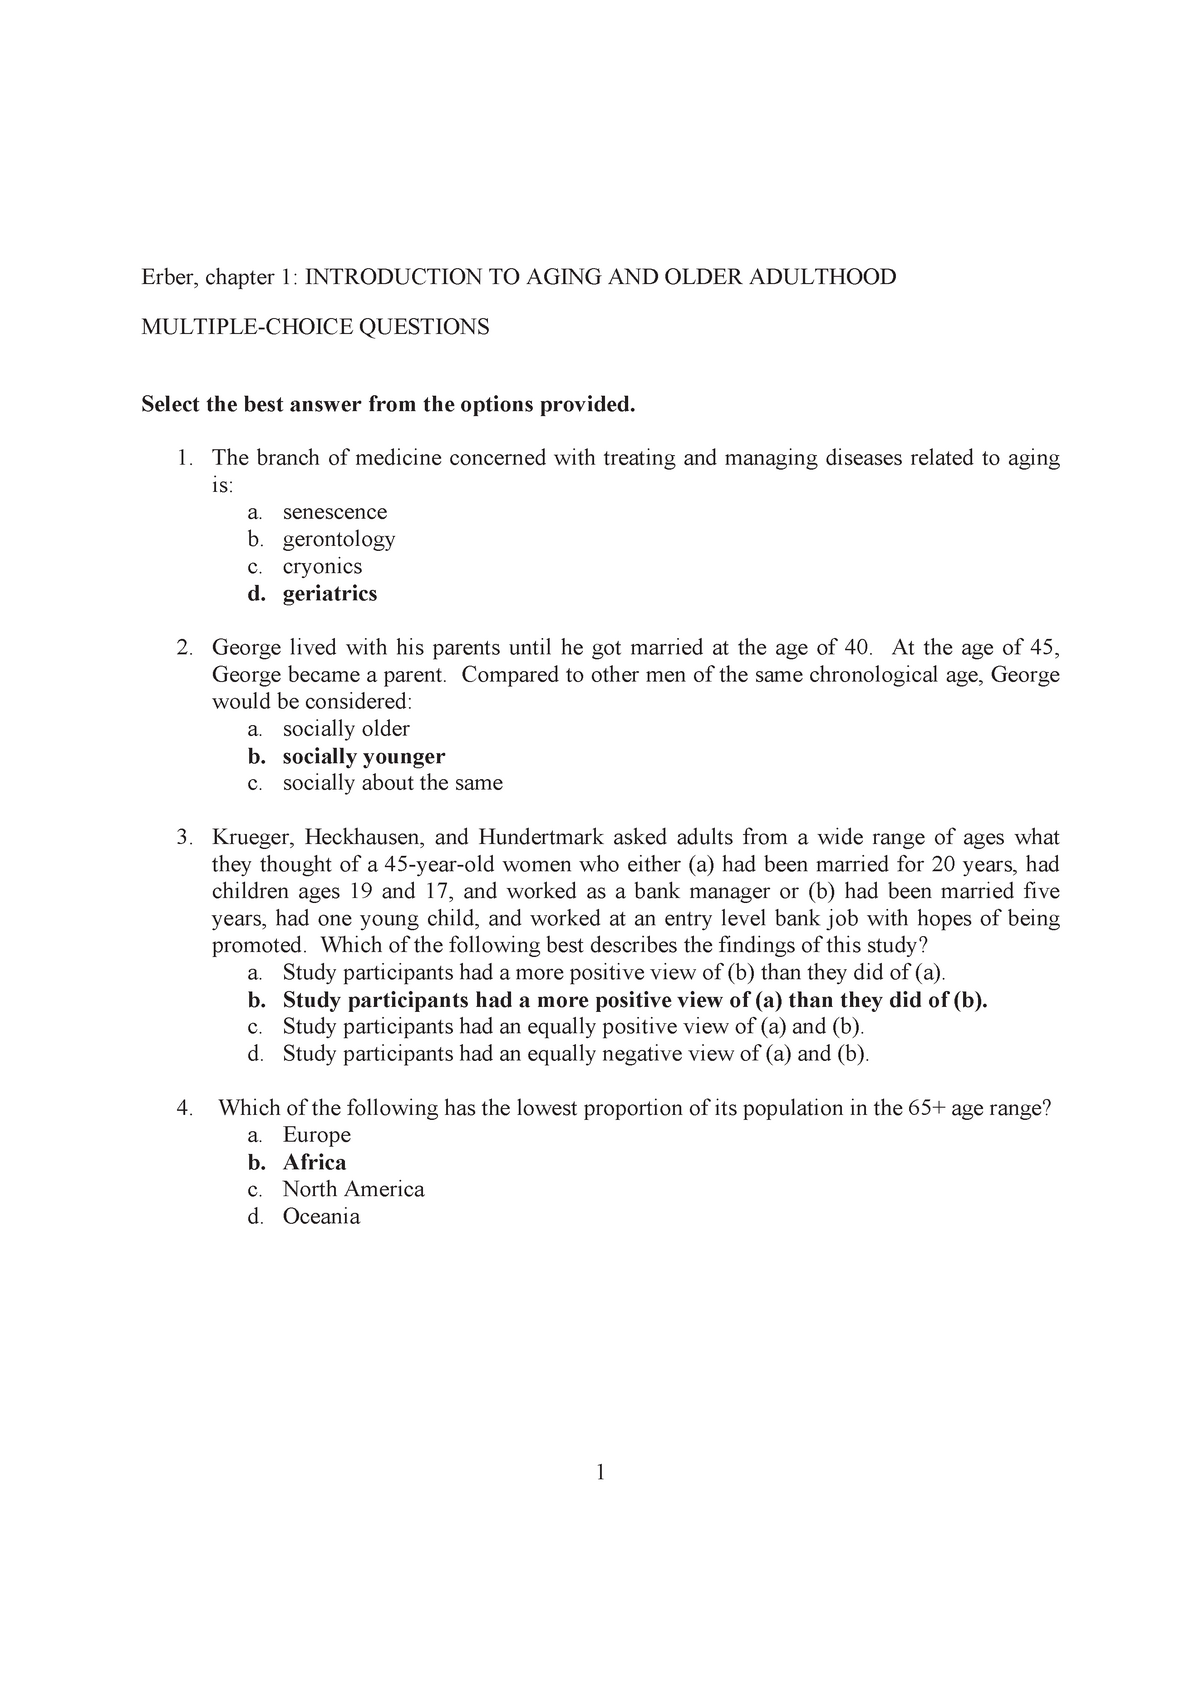 Vragen H01 - H12, Gerontologie - PSB3E-CN05: Gerontology - StuDocu